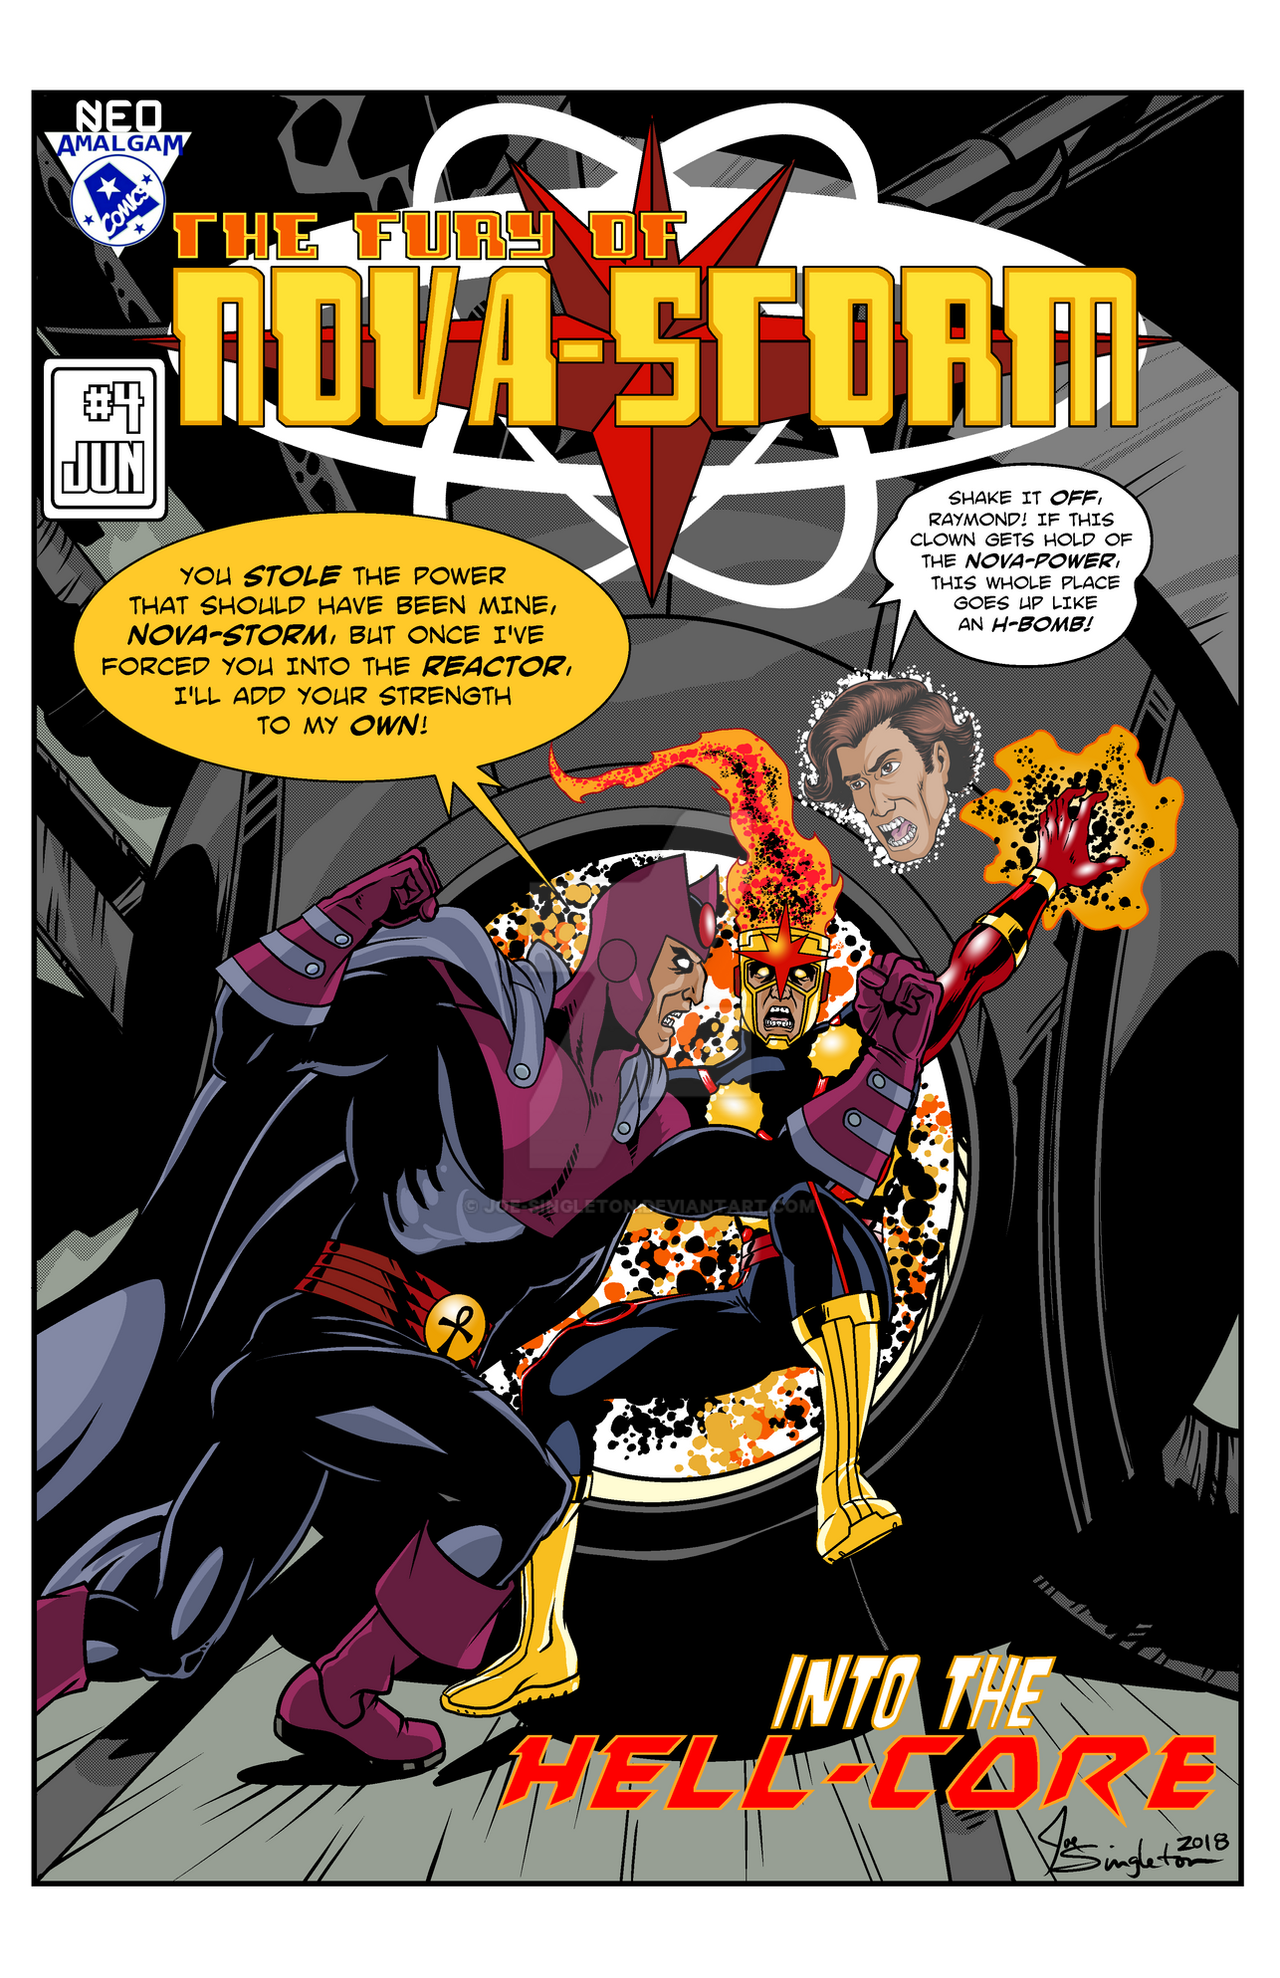 Novastorm Mock Cover by Joe-Singleton